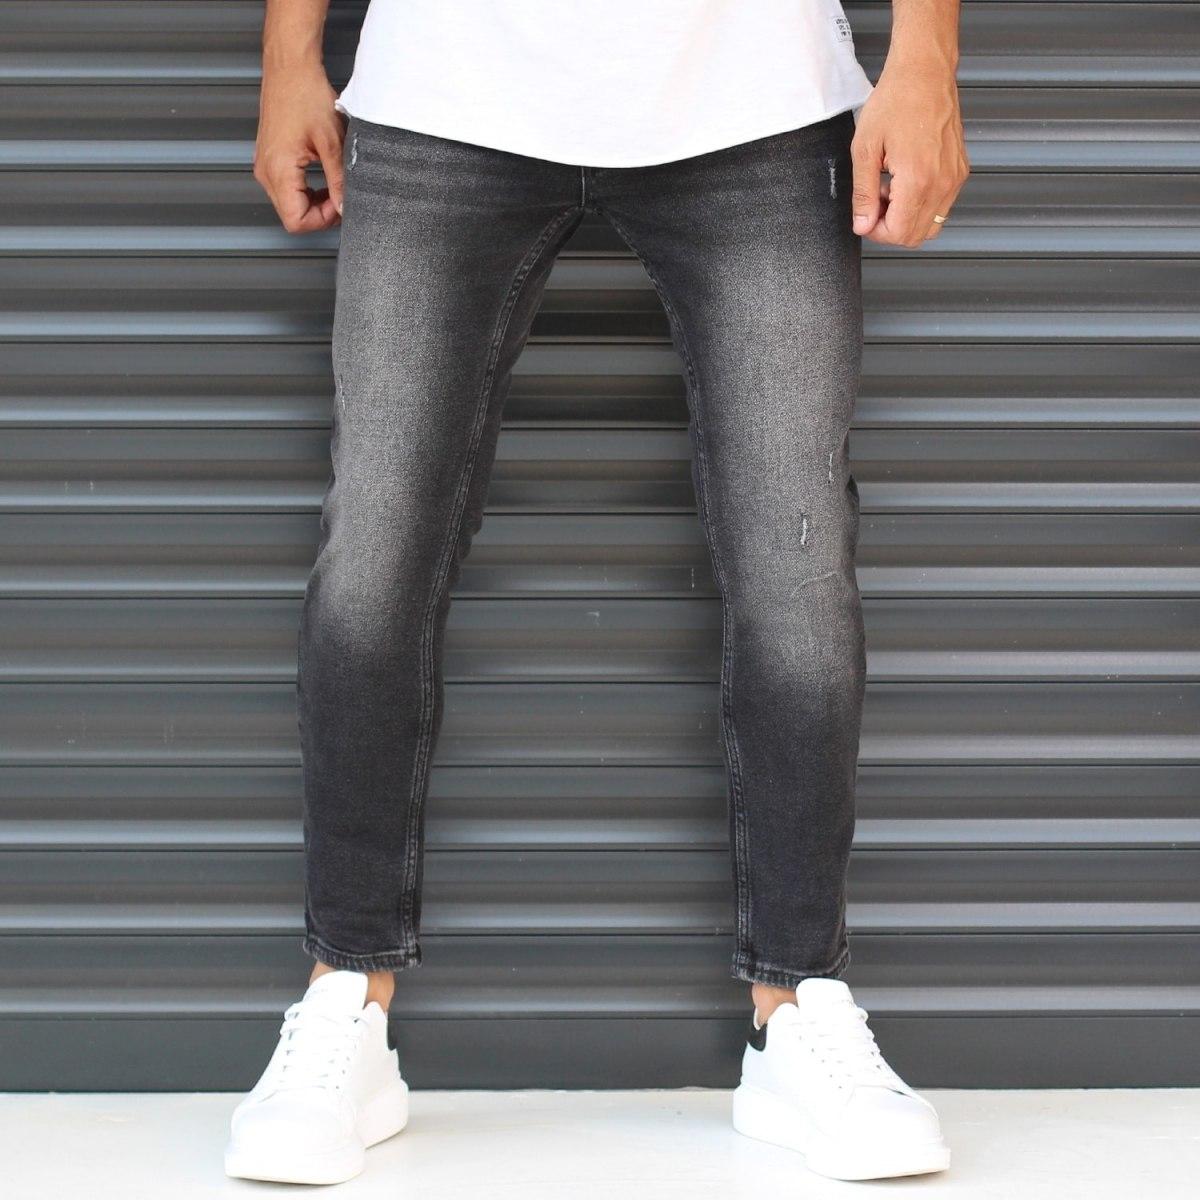 Men's Basic Stonewashed Jeans In Black Mv Premium Brand - 2